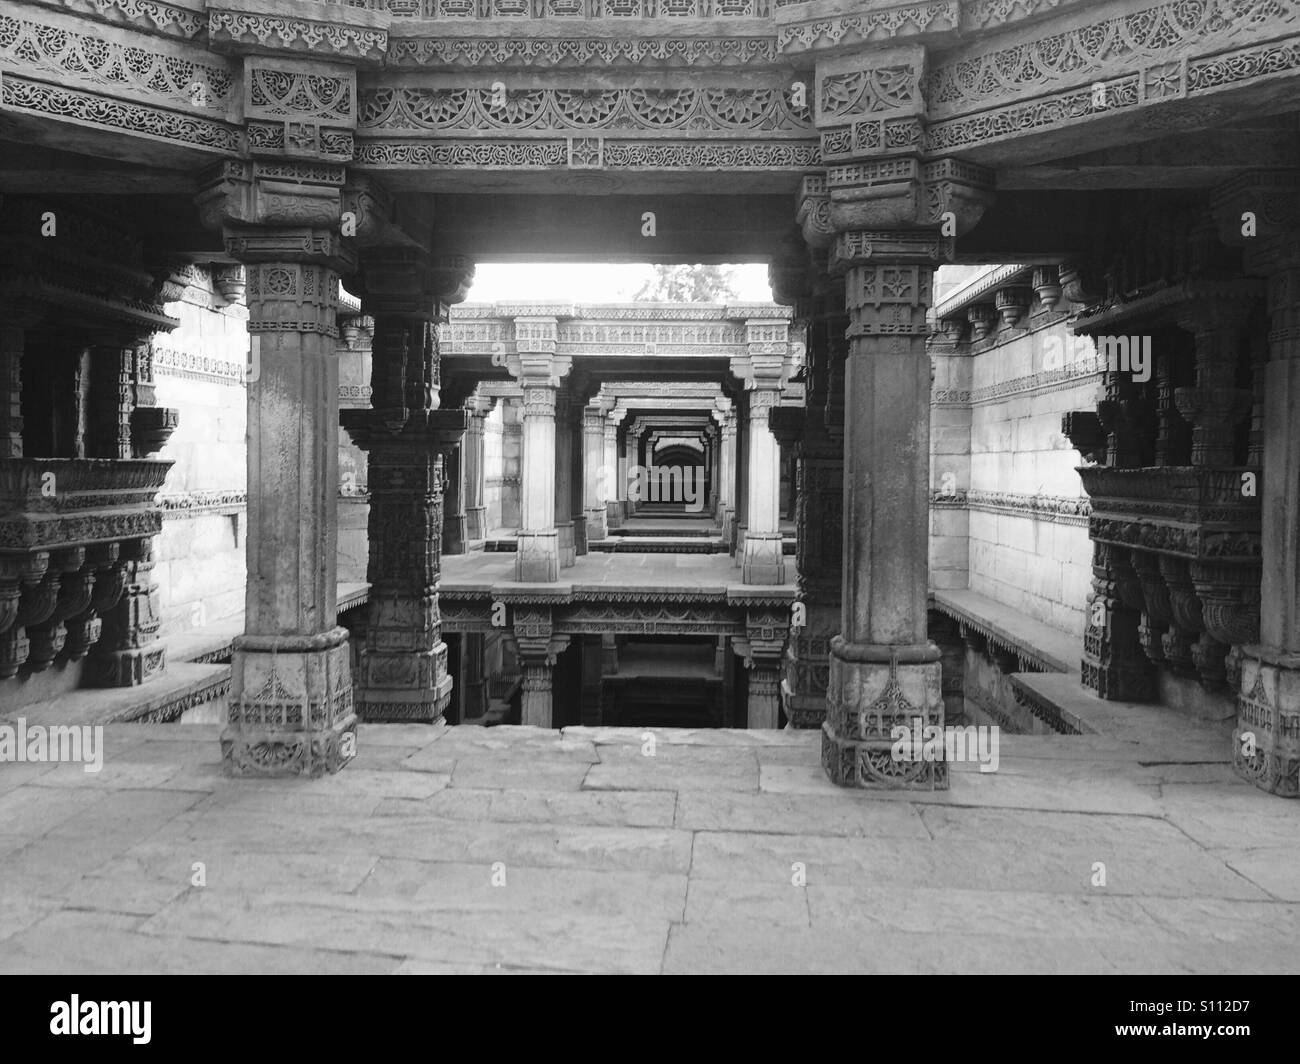 Acient monuments - Stock Image